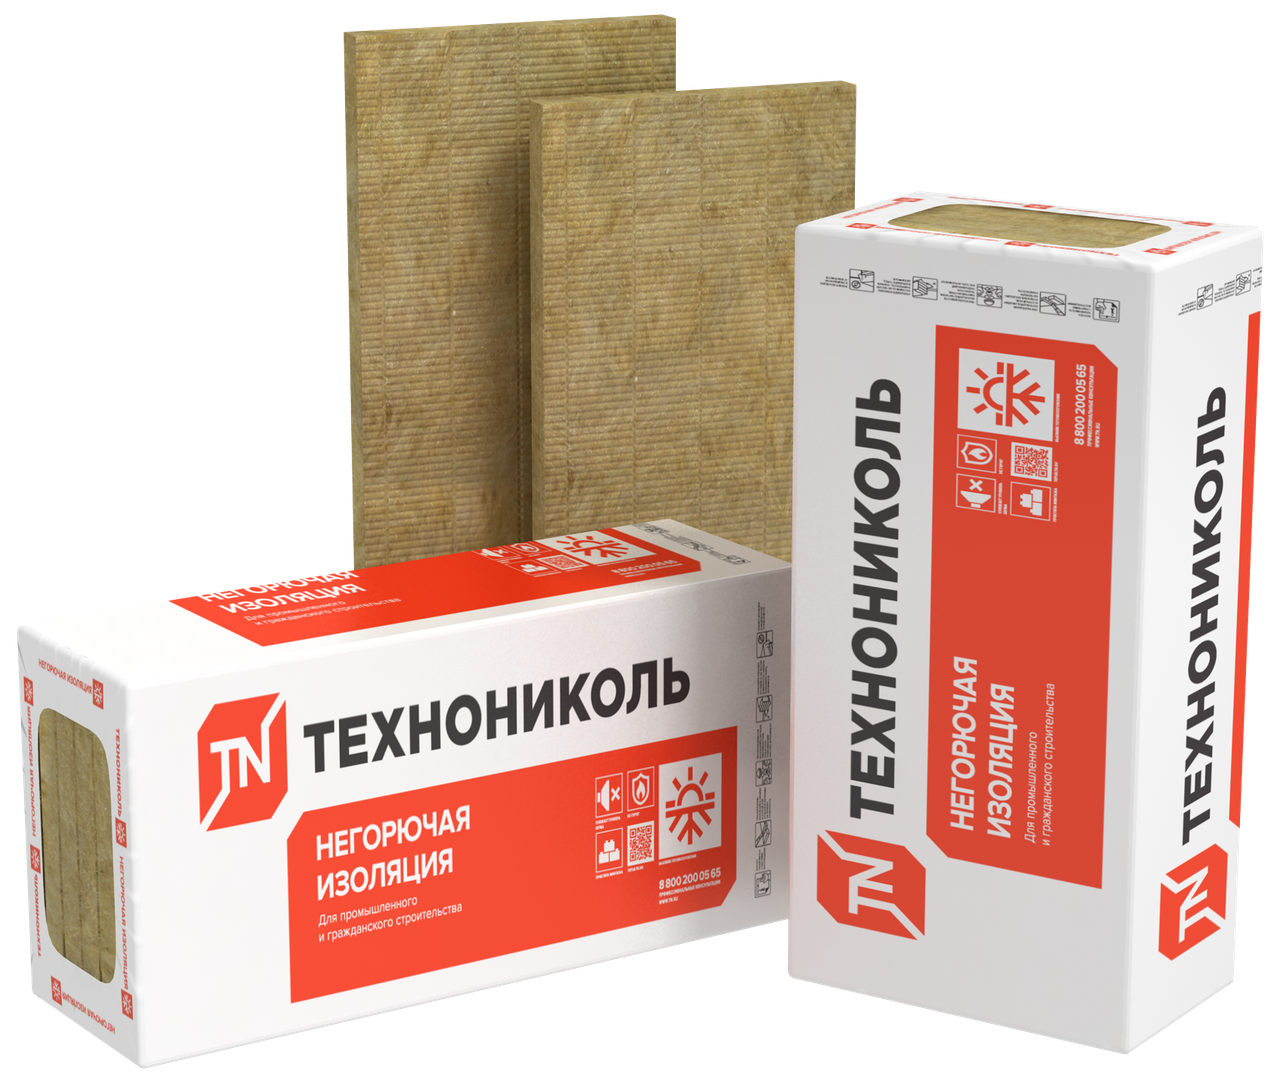 Утеплитель ТЕХНОФАС ОПТИМА 50 мм 120 кг/м3 ТехноНиколь (2,88 м.кв в уп)